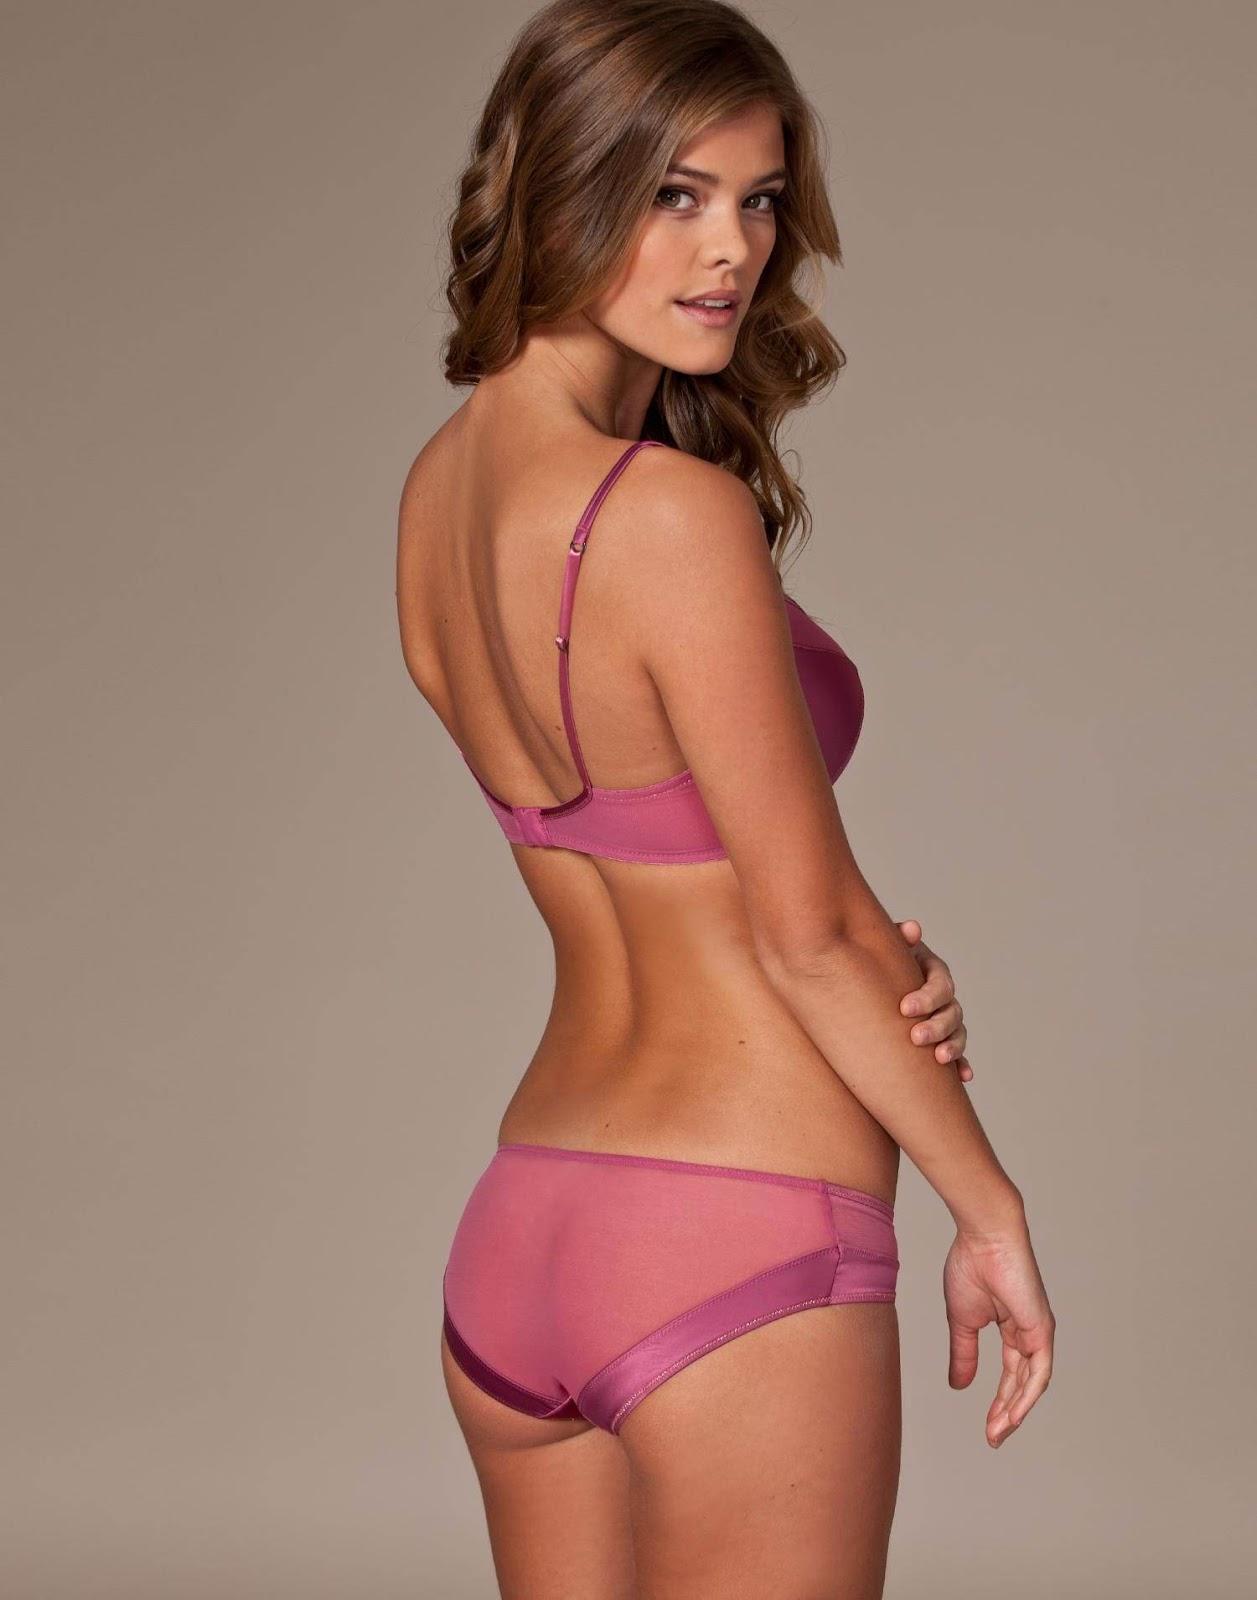 http://4.bp.blogspot.com/-6Wig2BT9kOA/UEsMD7bWJTI/AAAAAAAANhw/40aLgSHwdjc/s1600/nina+agdal+hot+pics+photos+bikini17.jpg